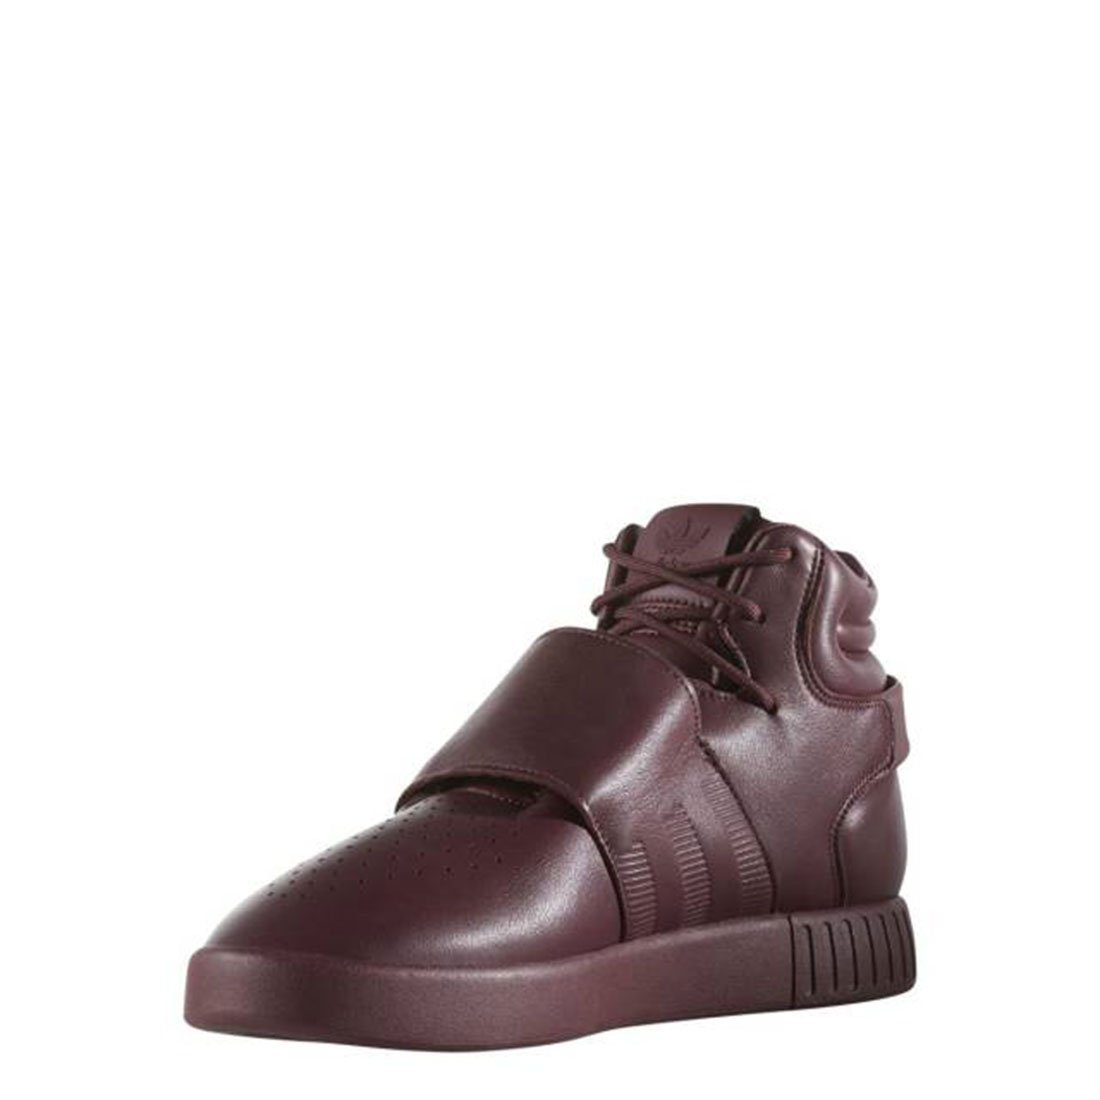 Adidas Tubular Invader Strap MaroonMaroon BW0873 Men's Size 10